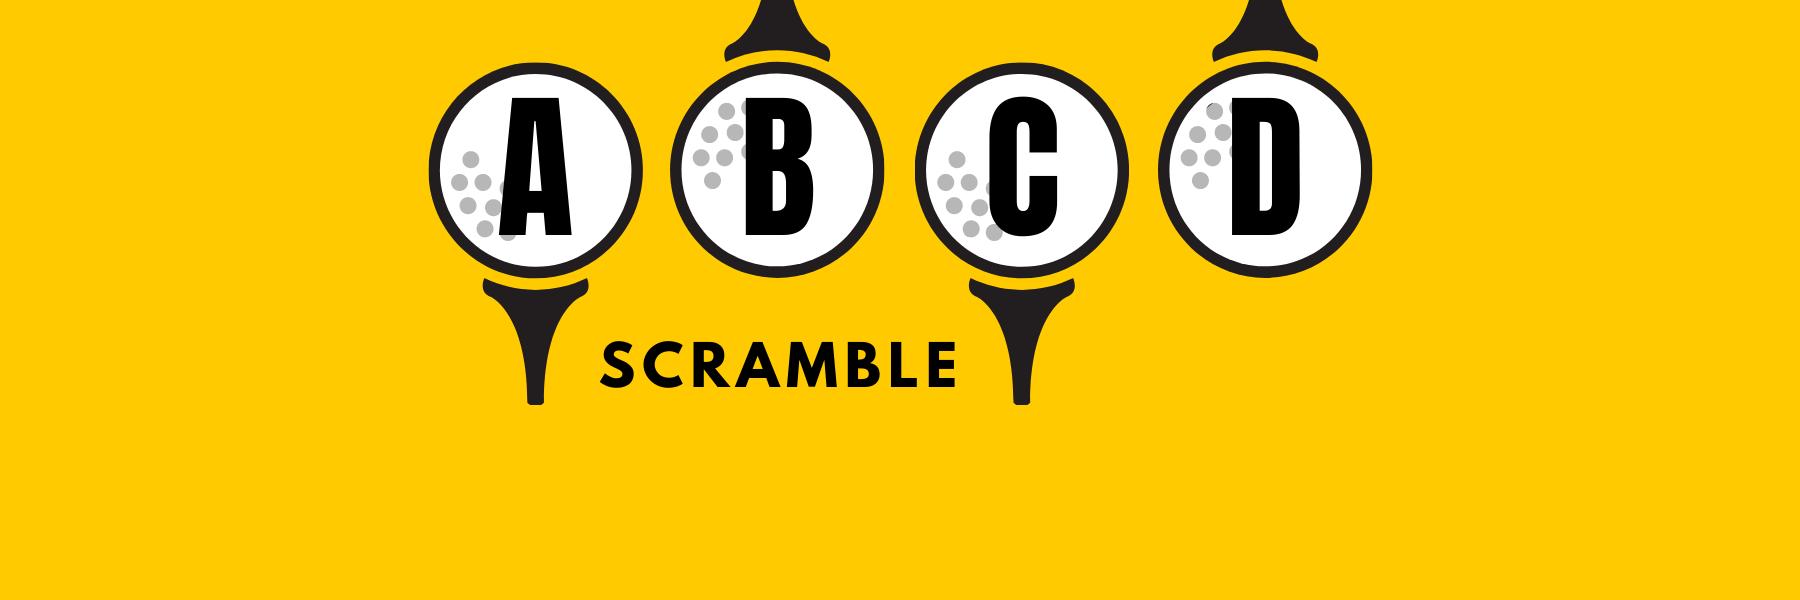 ABCD Scramble at Lakeview Golf Club